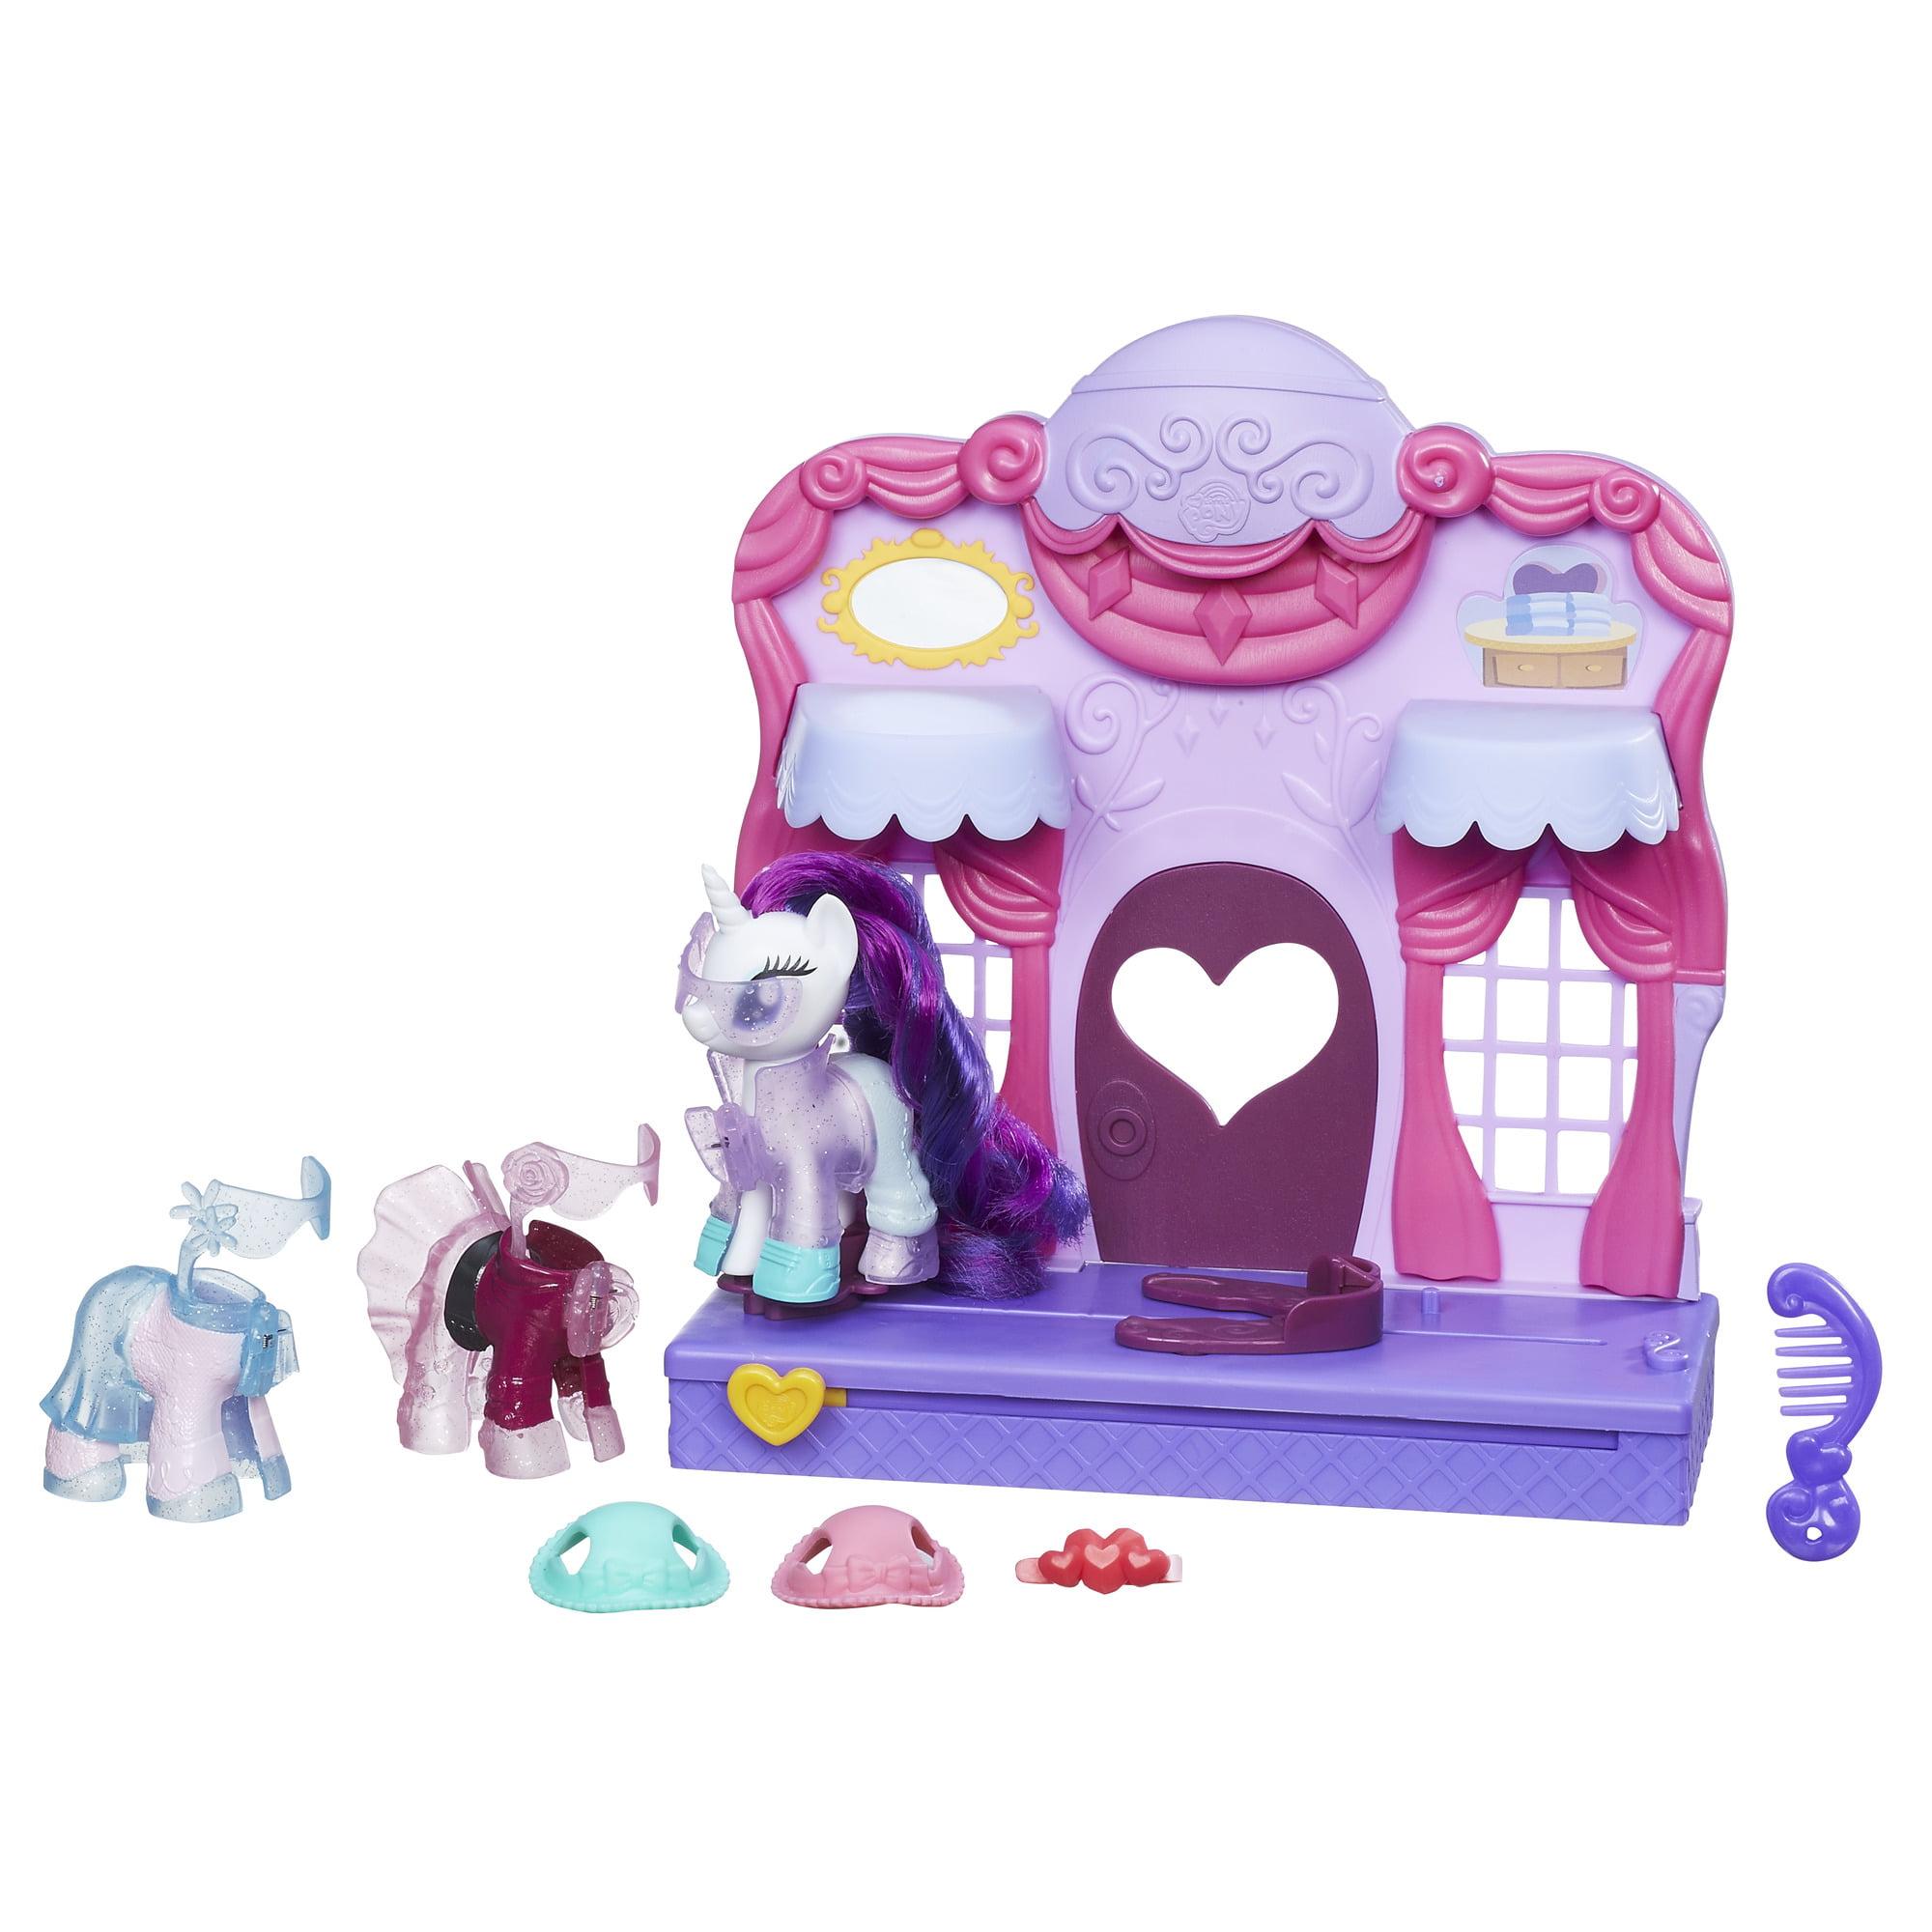 My Little Pony Friendship is Magic Rarity® Fashion Runway™ Playset